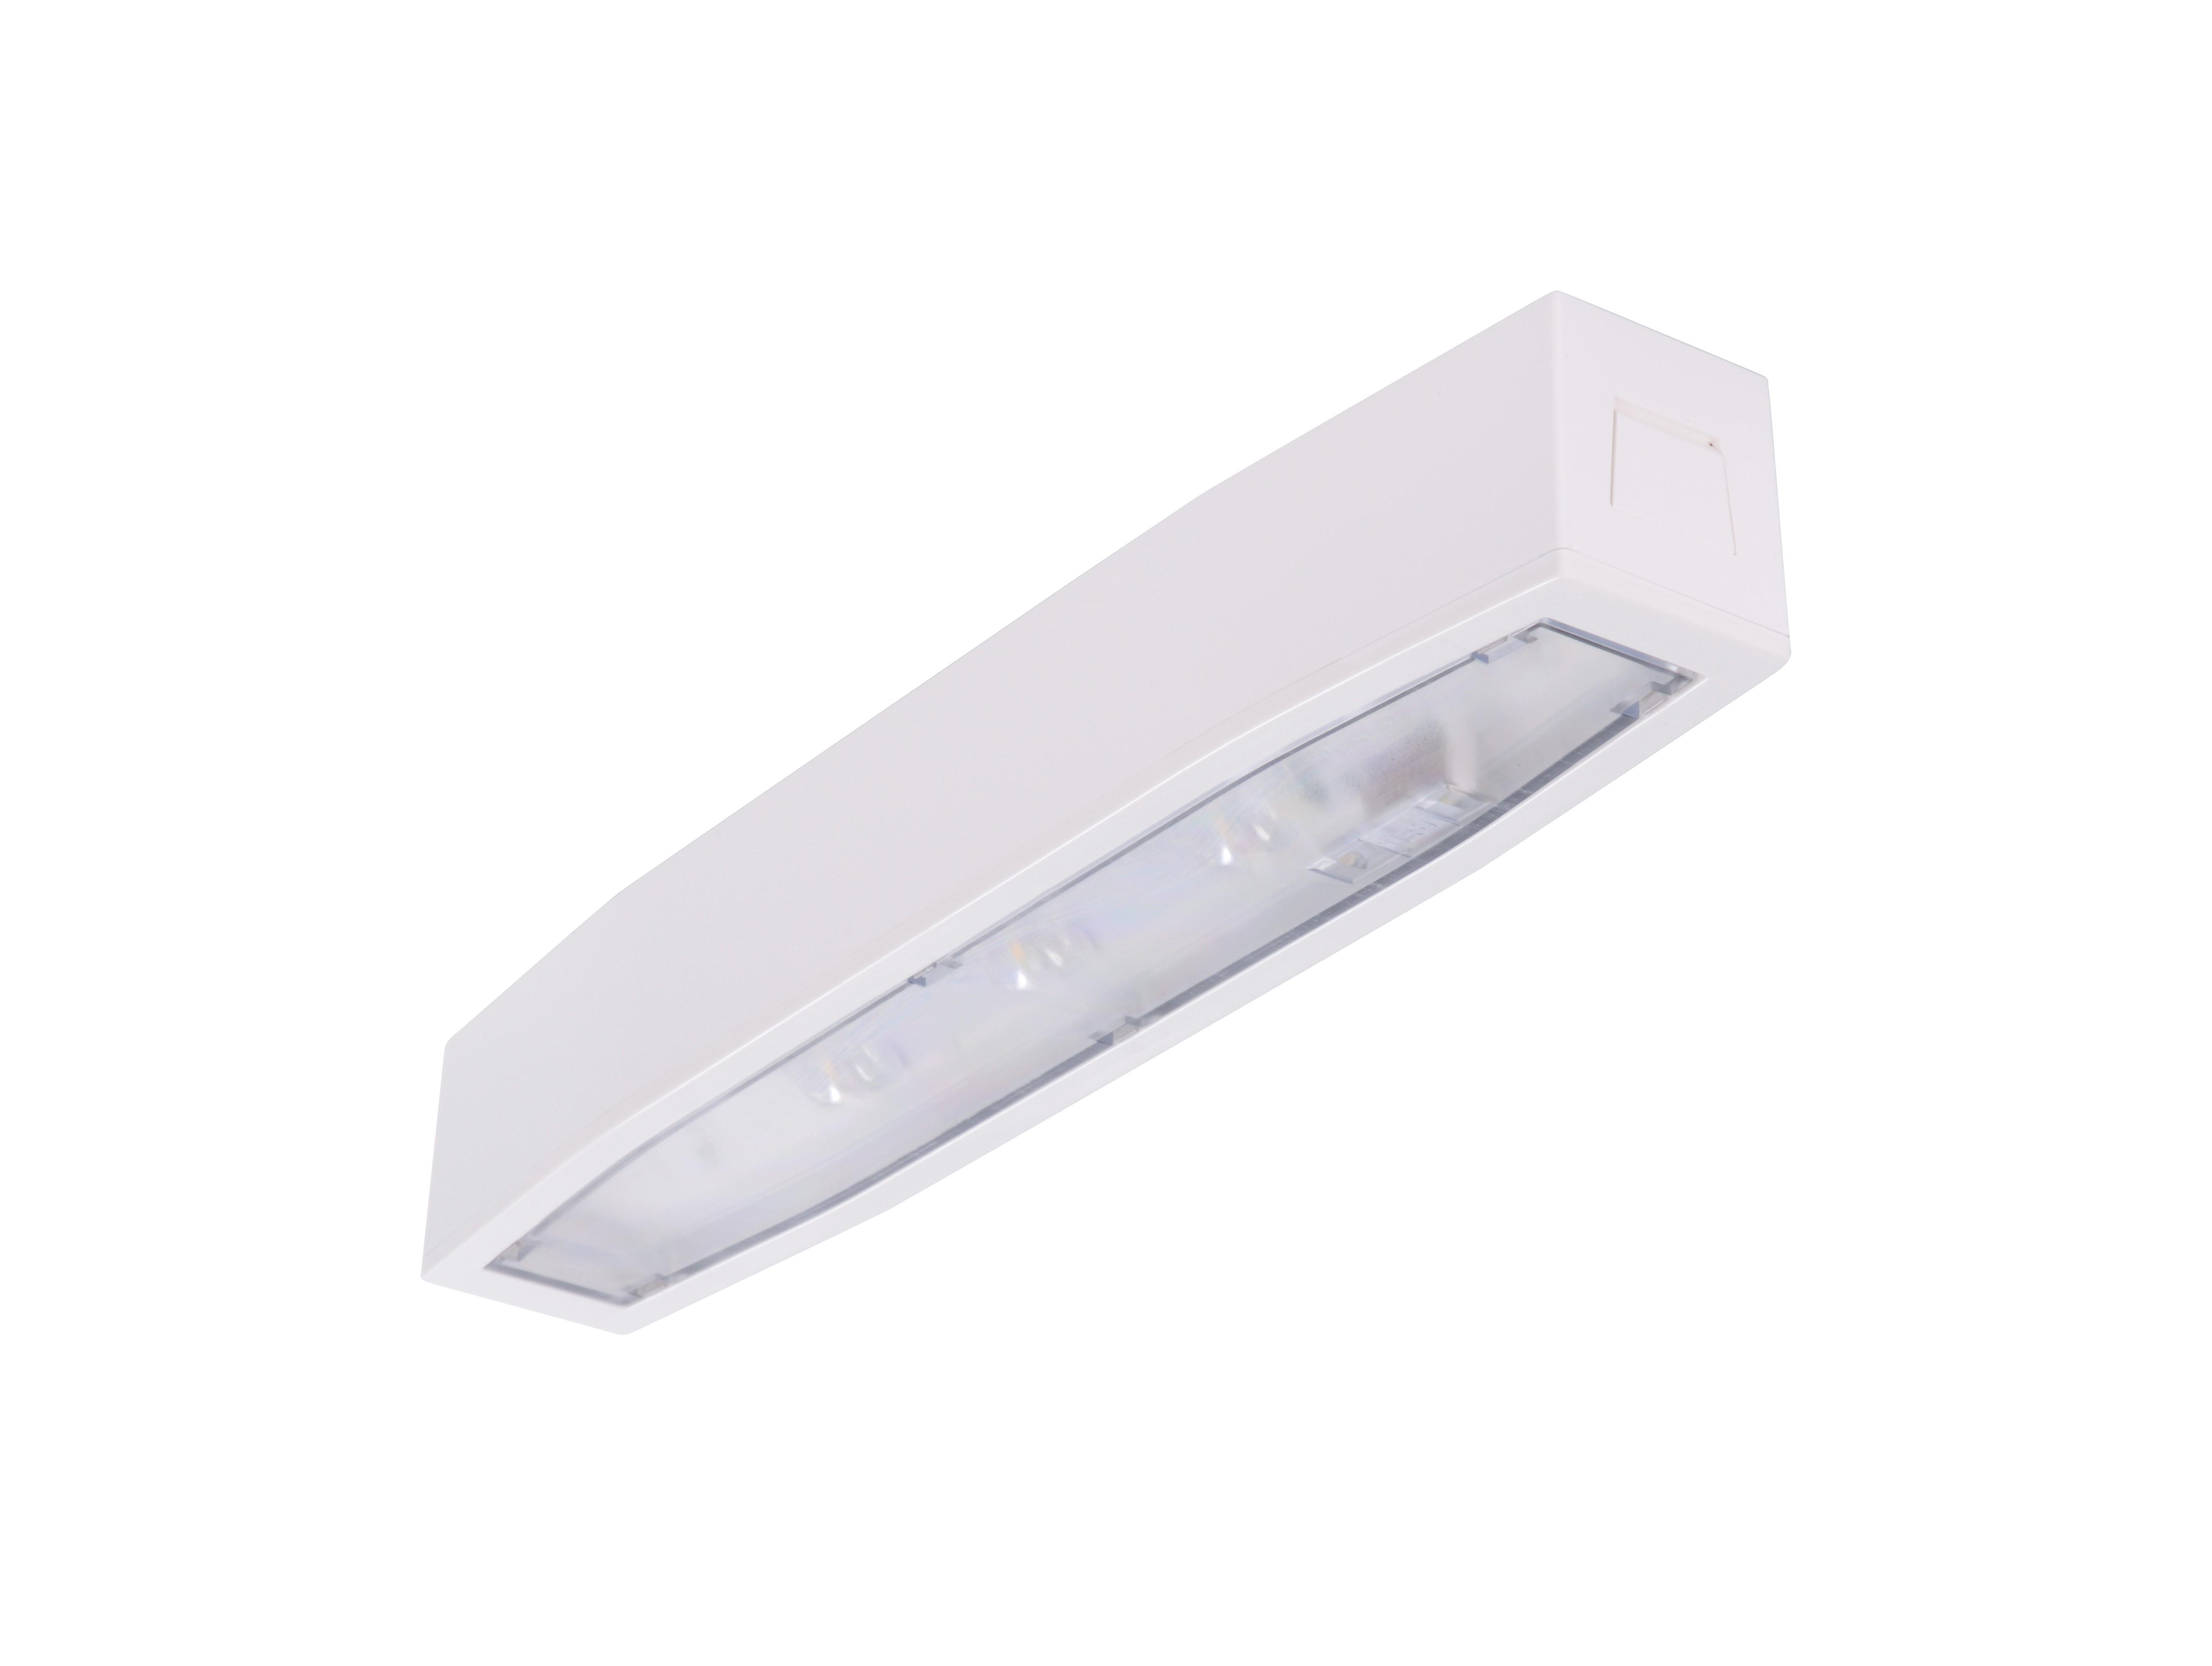 Lampa emergenta led Intelight 94504   3h mentinut test automat 0